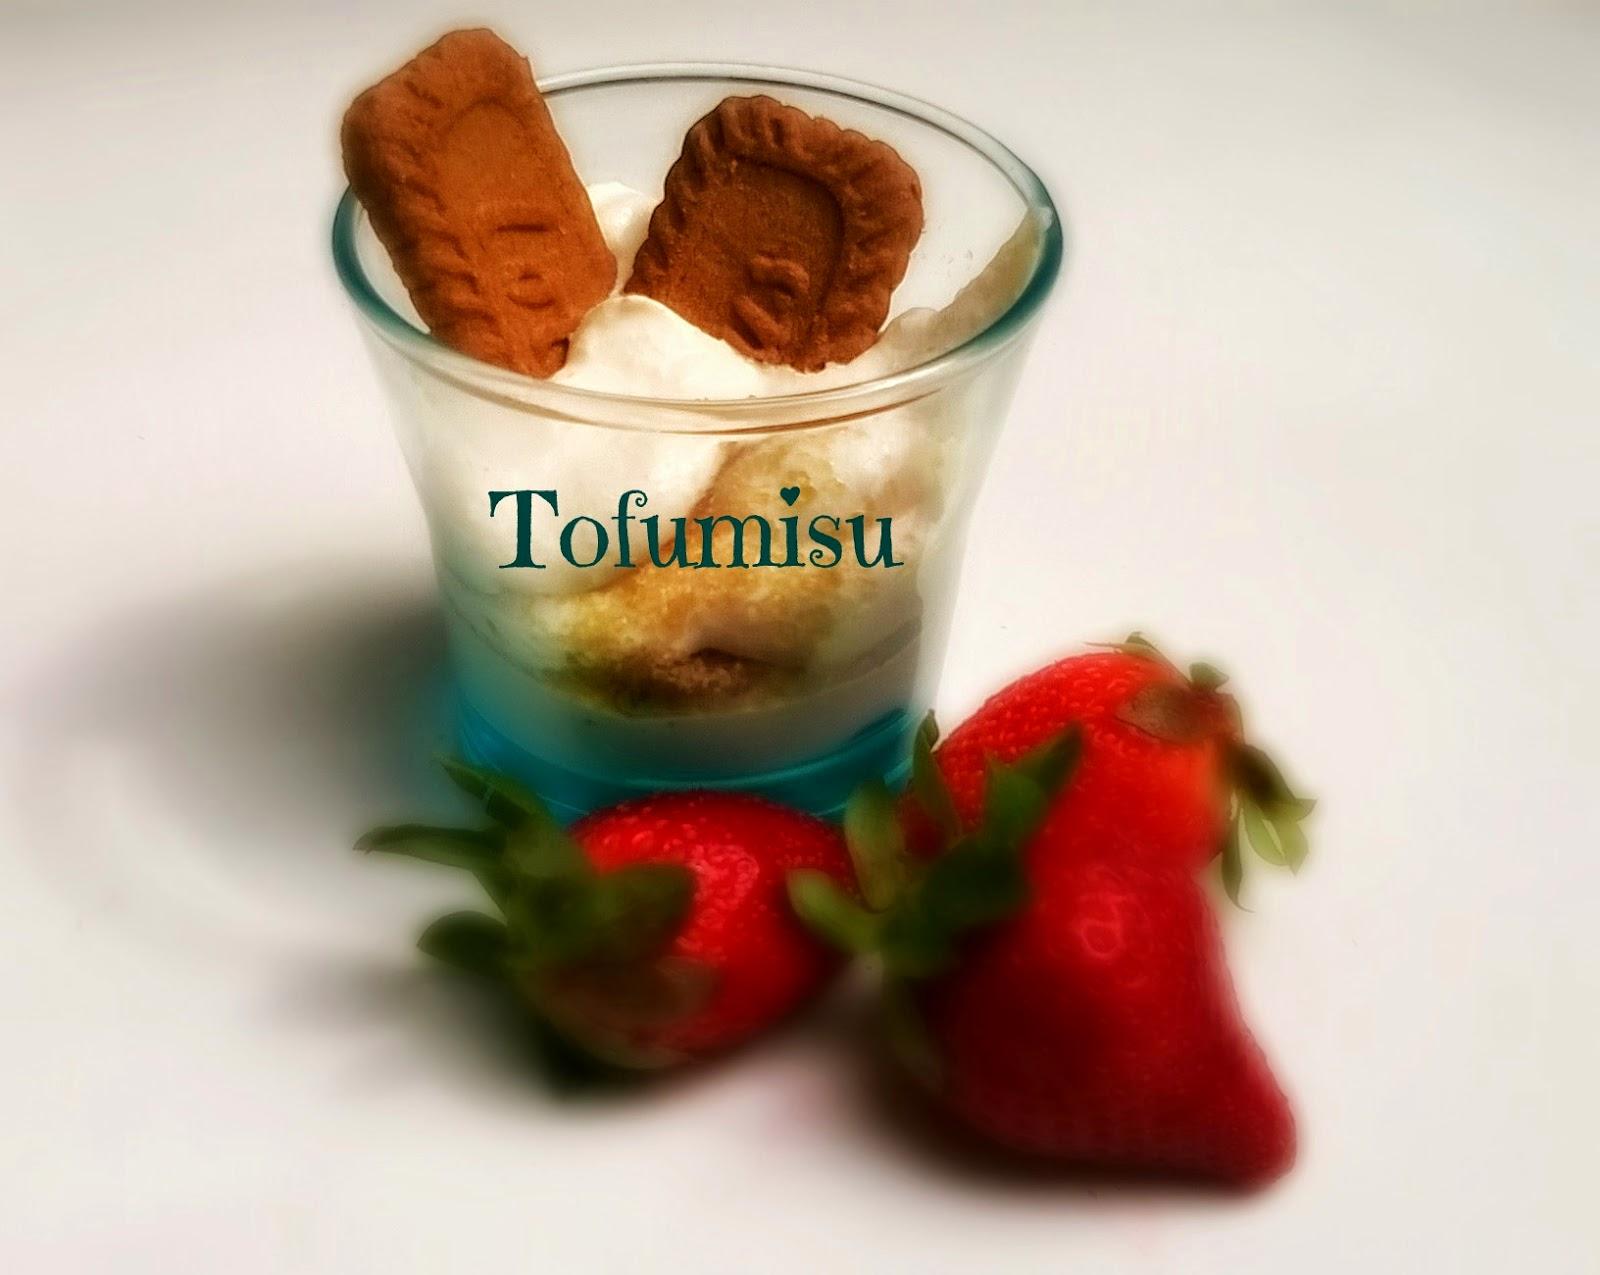 tofumisu, tofu, tiramisu